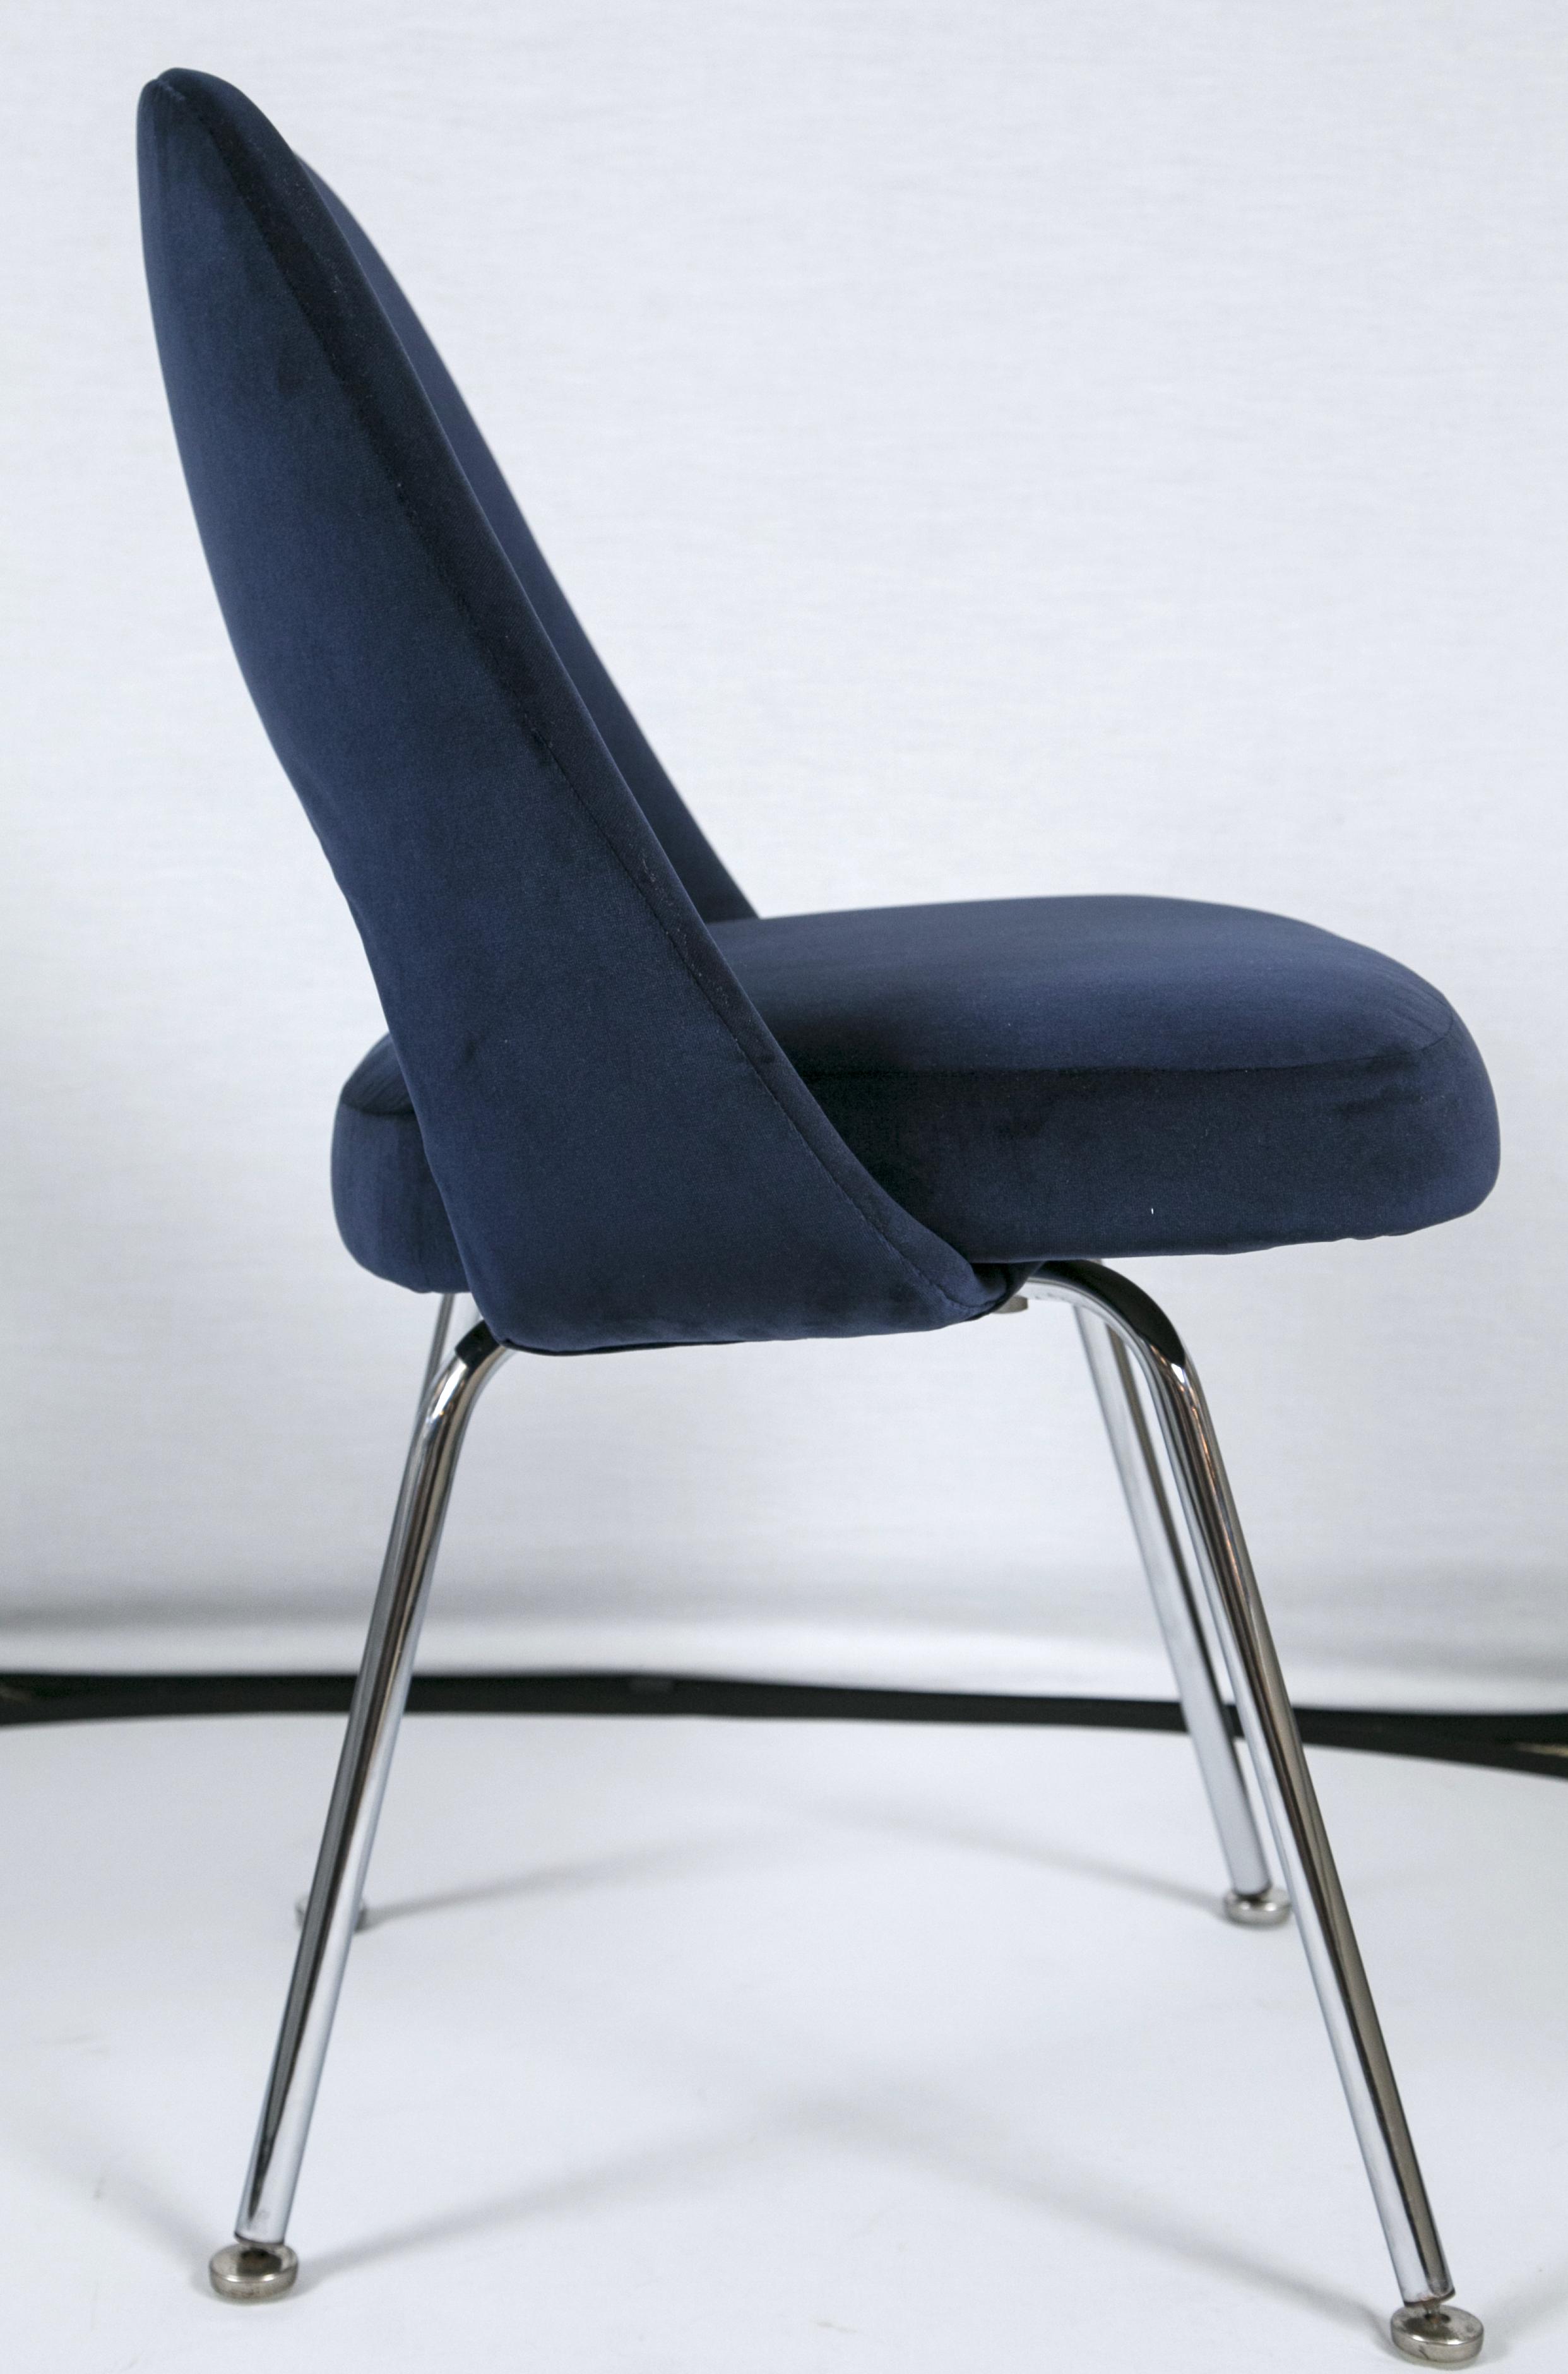 Merveilleux Saarinen Executive Armless Chairs In Navy Velvet   Set Of 6   Image 4 Of 7